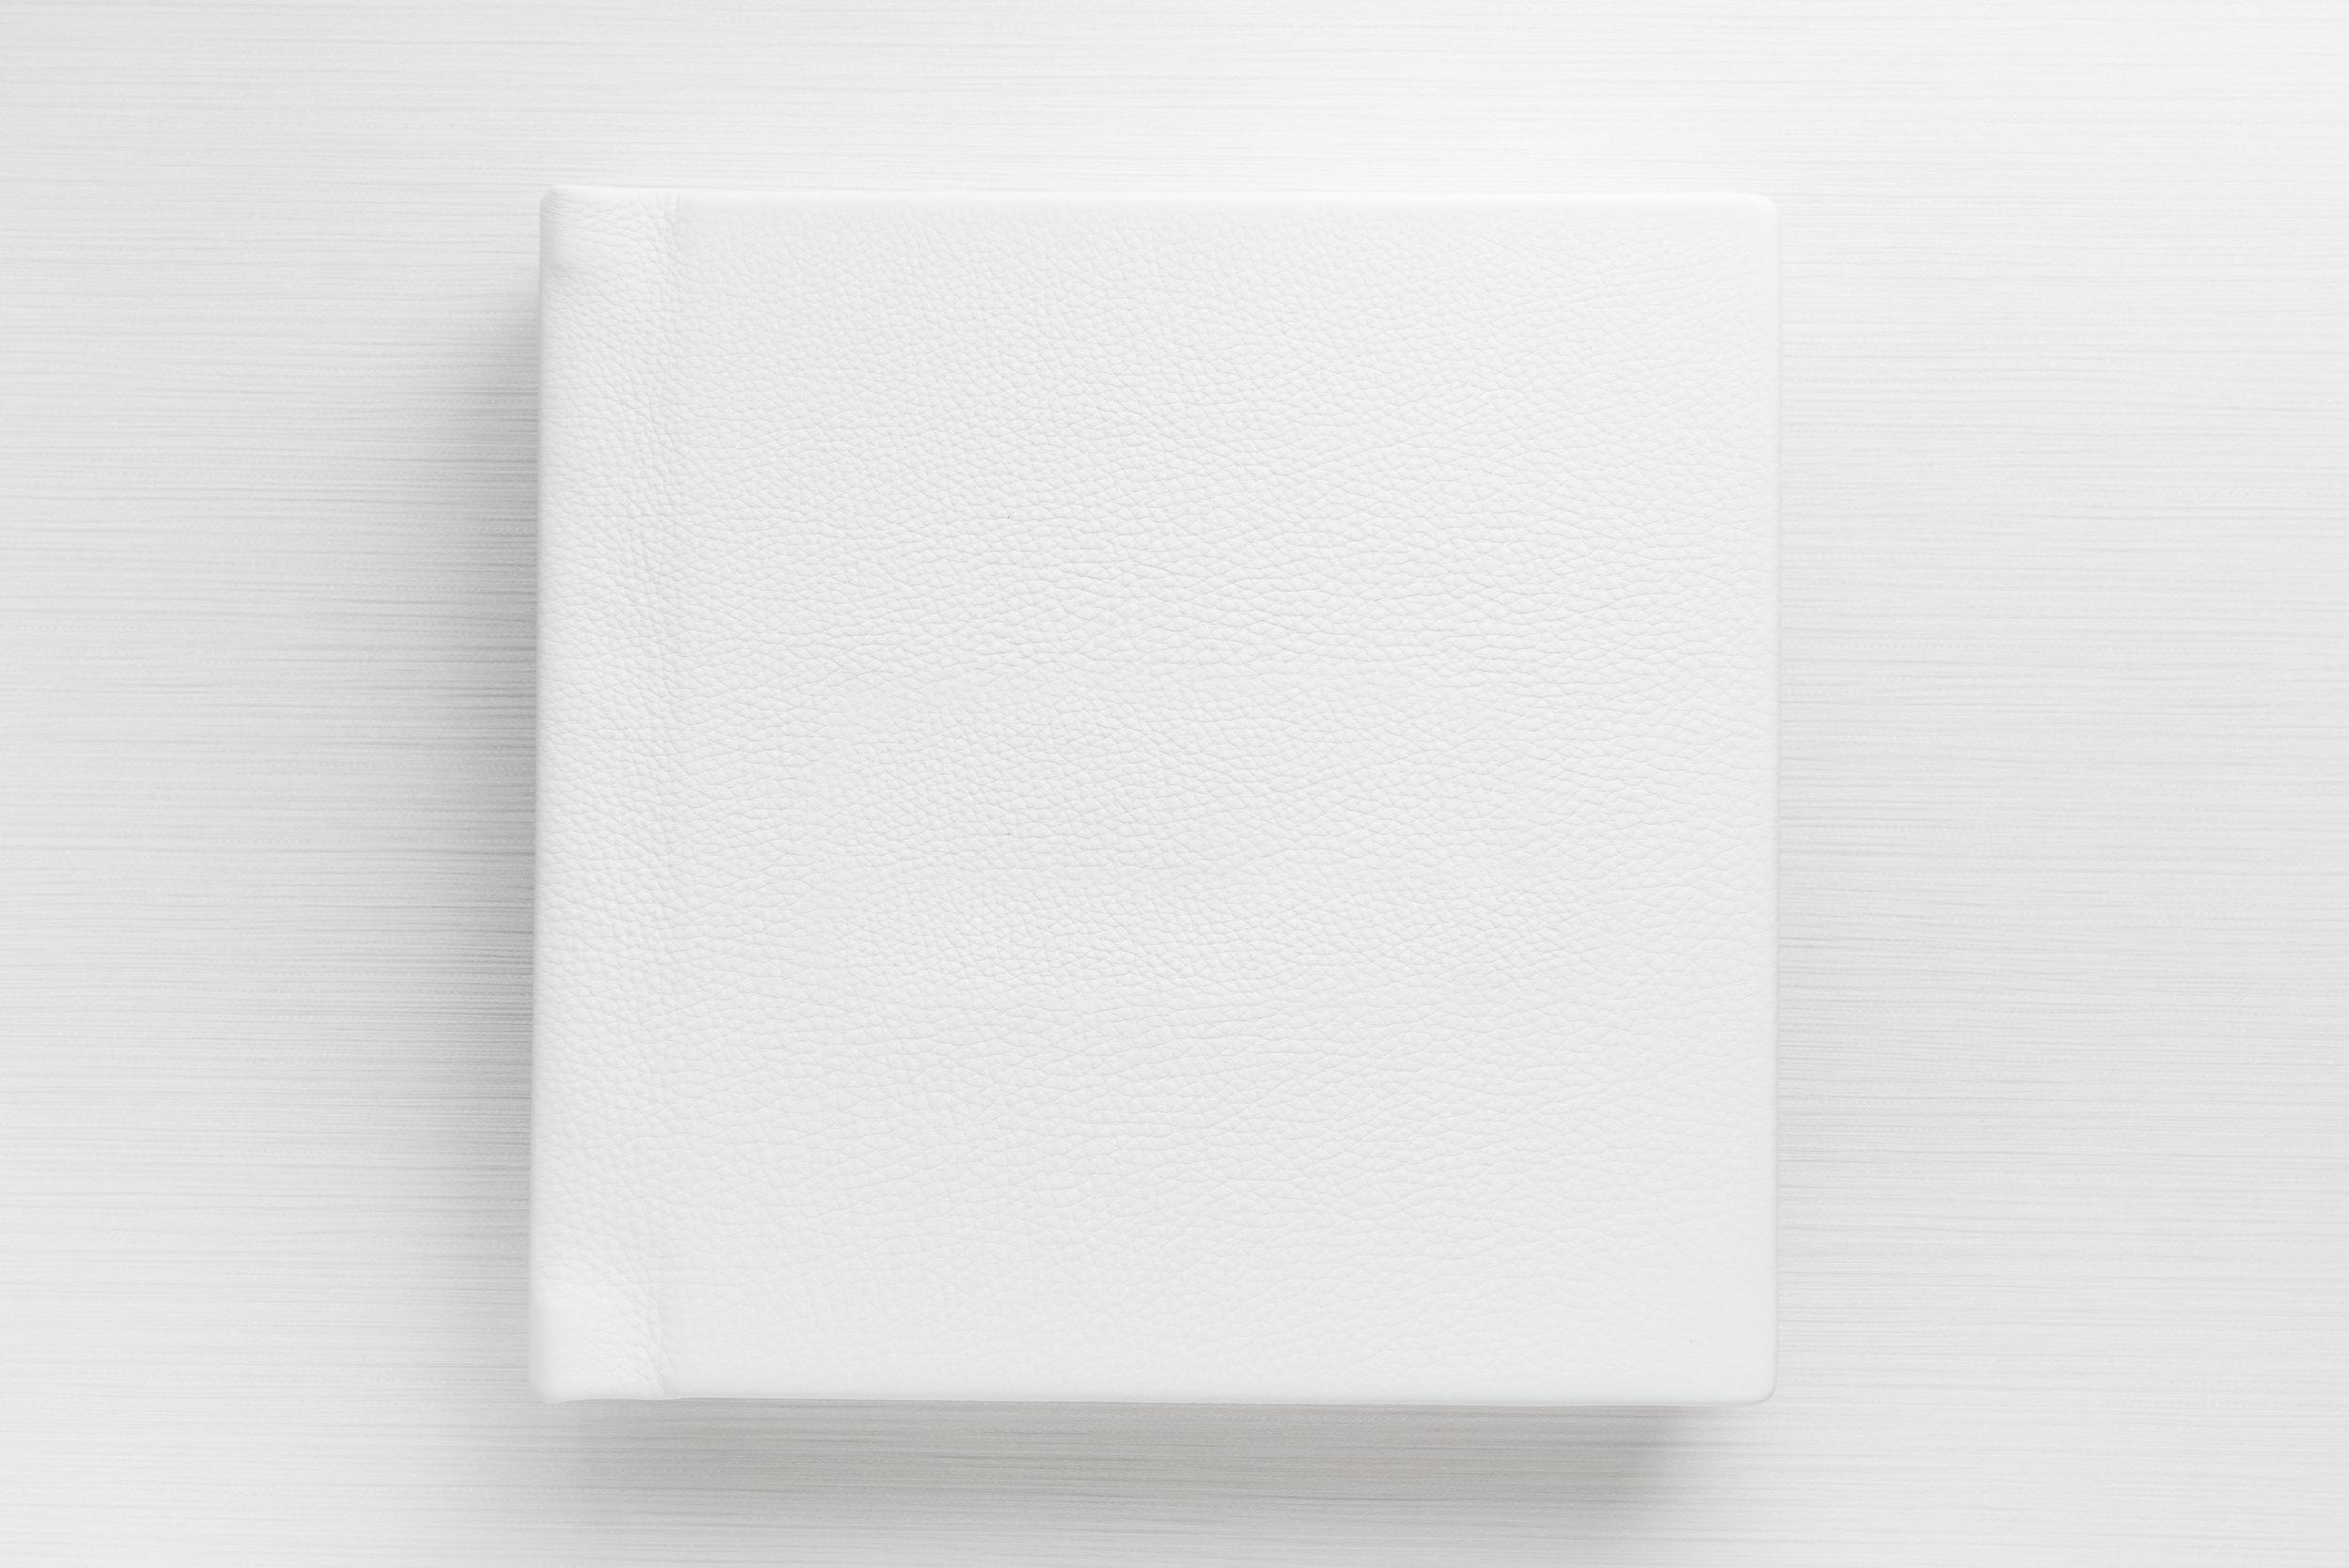 Studio album samples-5.jpg